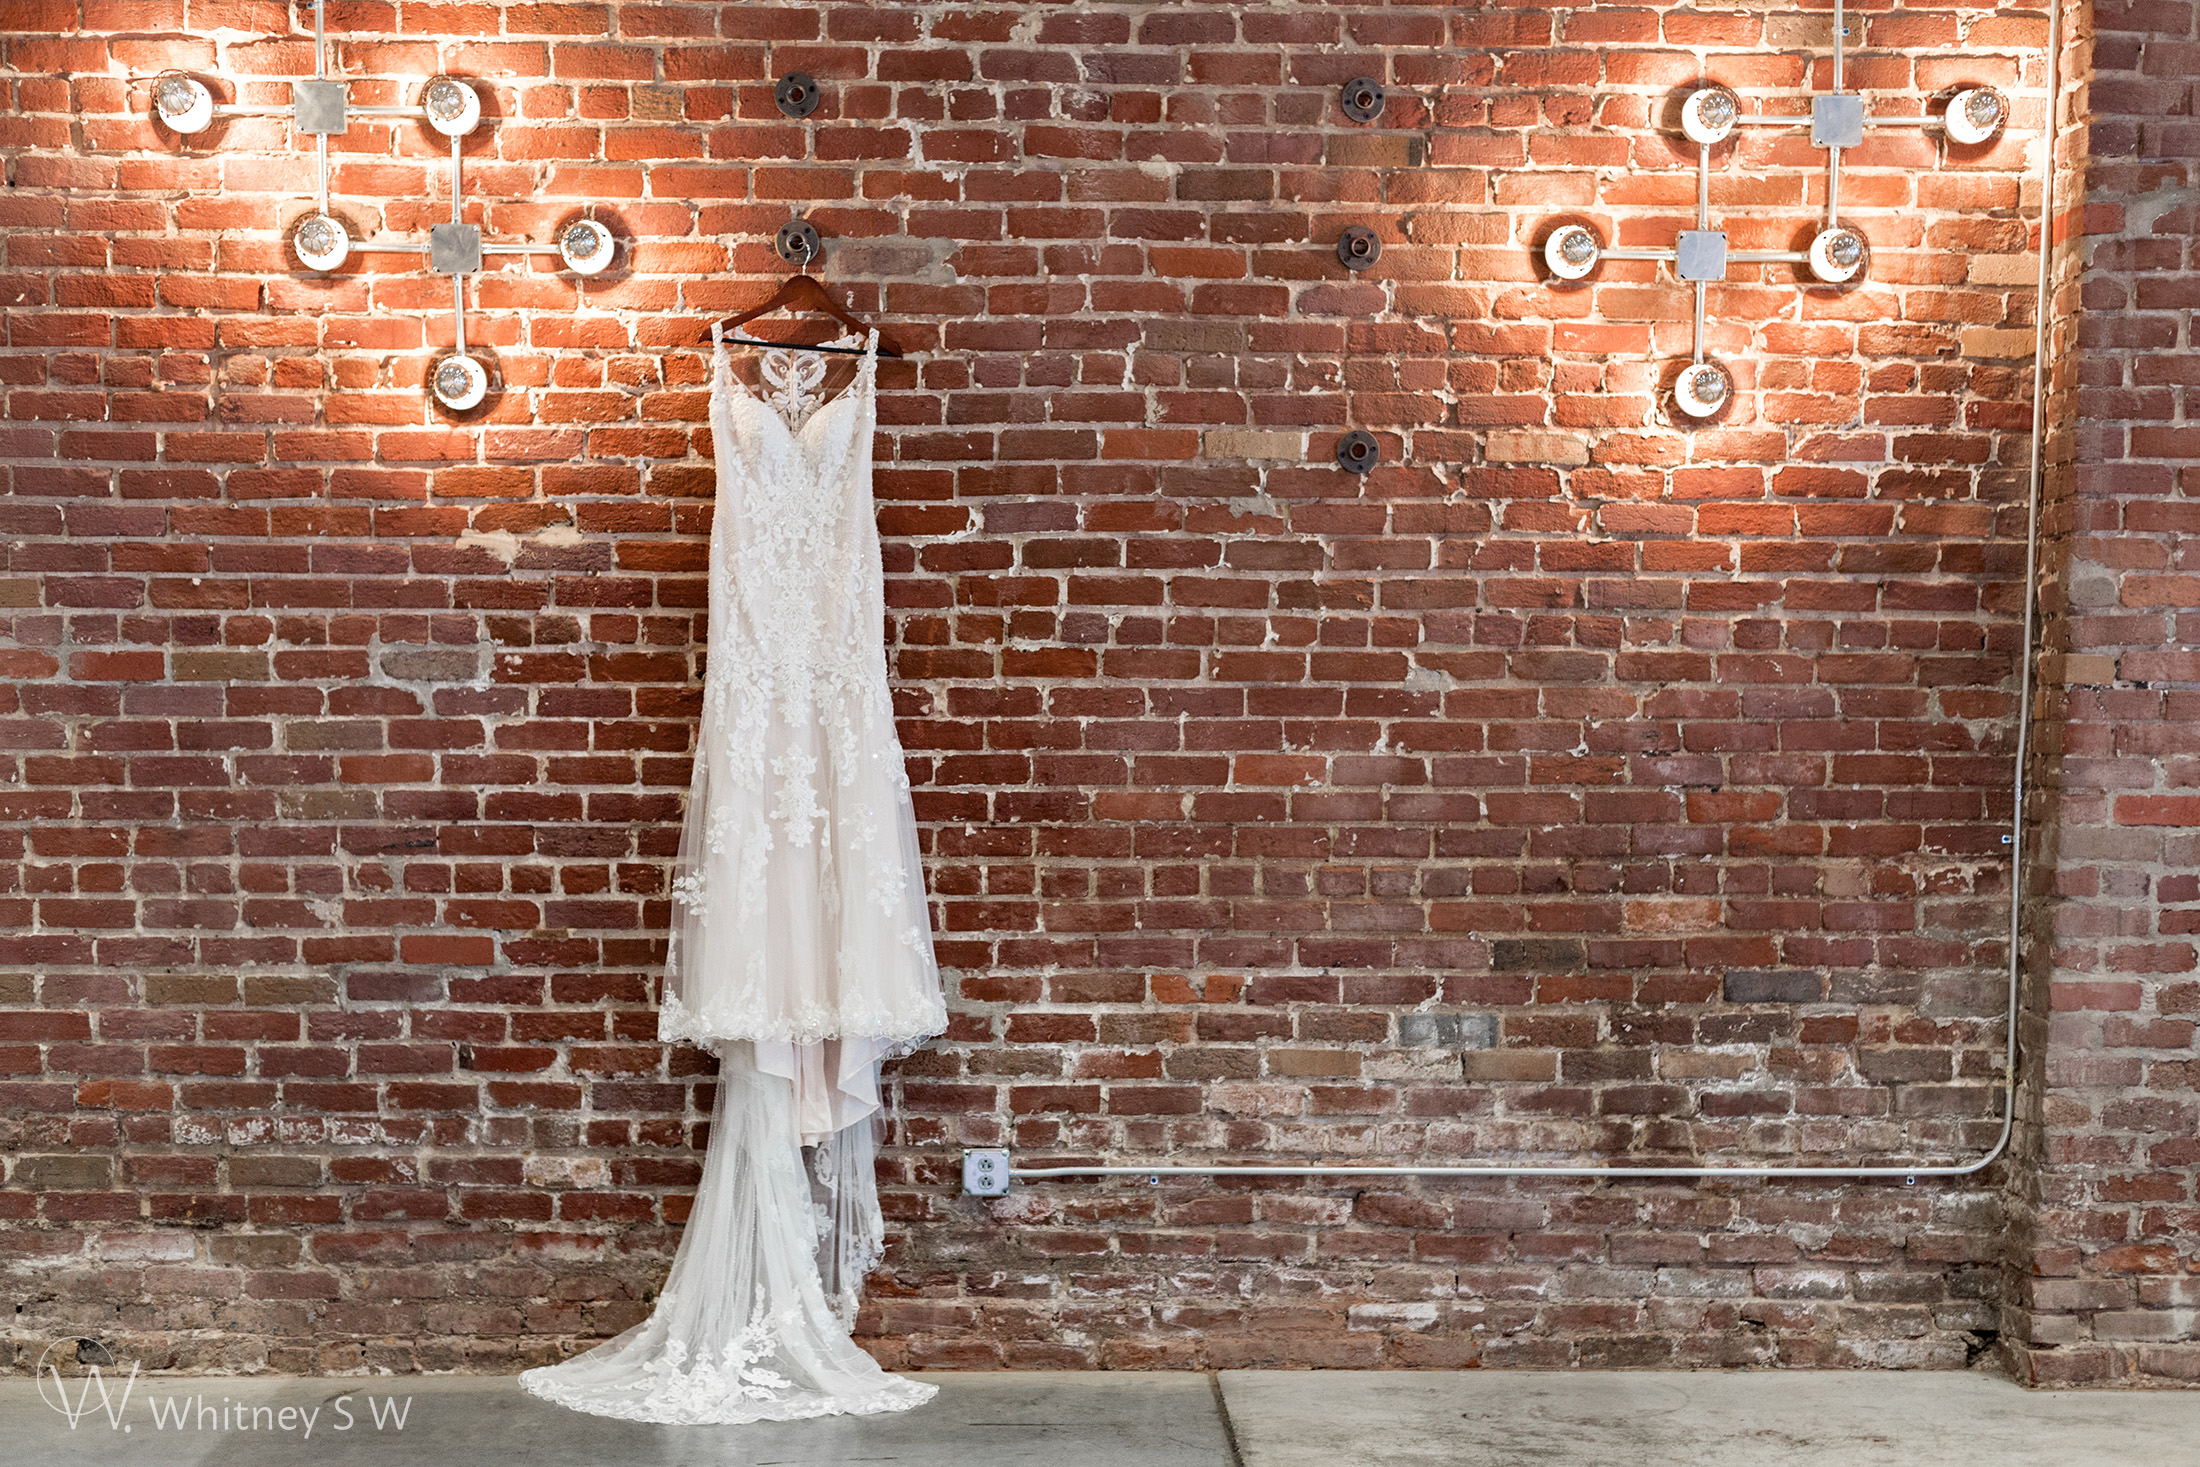 Morgan & Kaivon Wedding - Photography by Whitney S Williams whitneysw (12).jpg